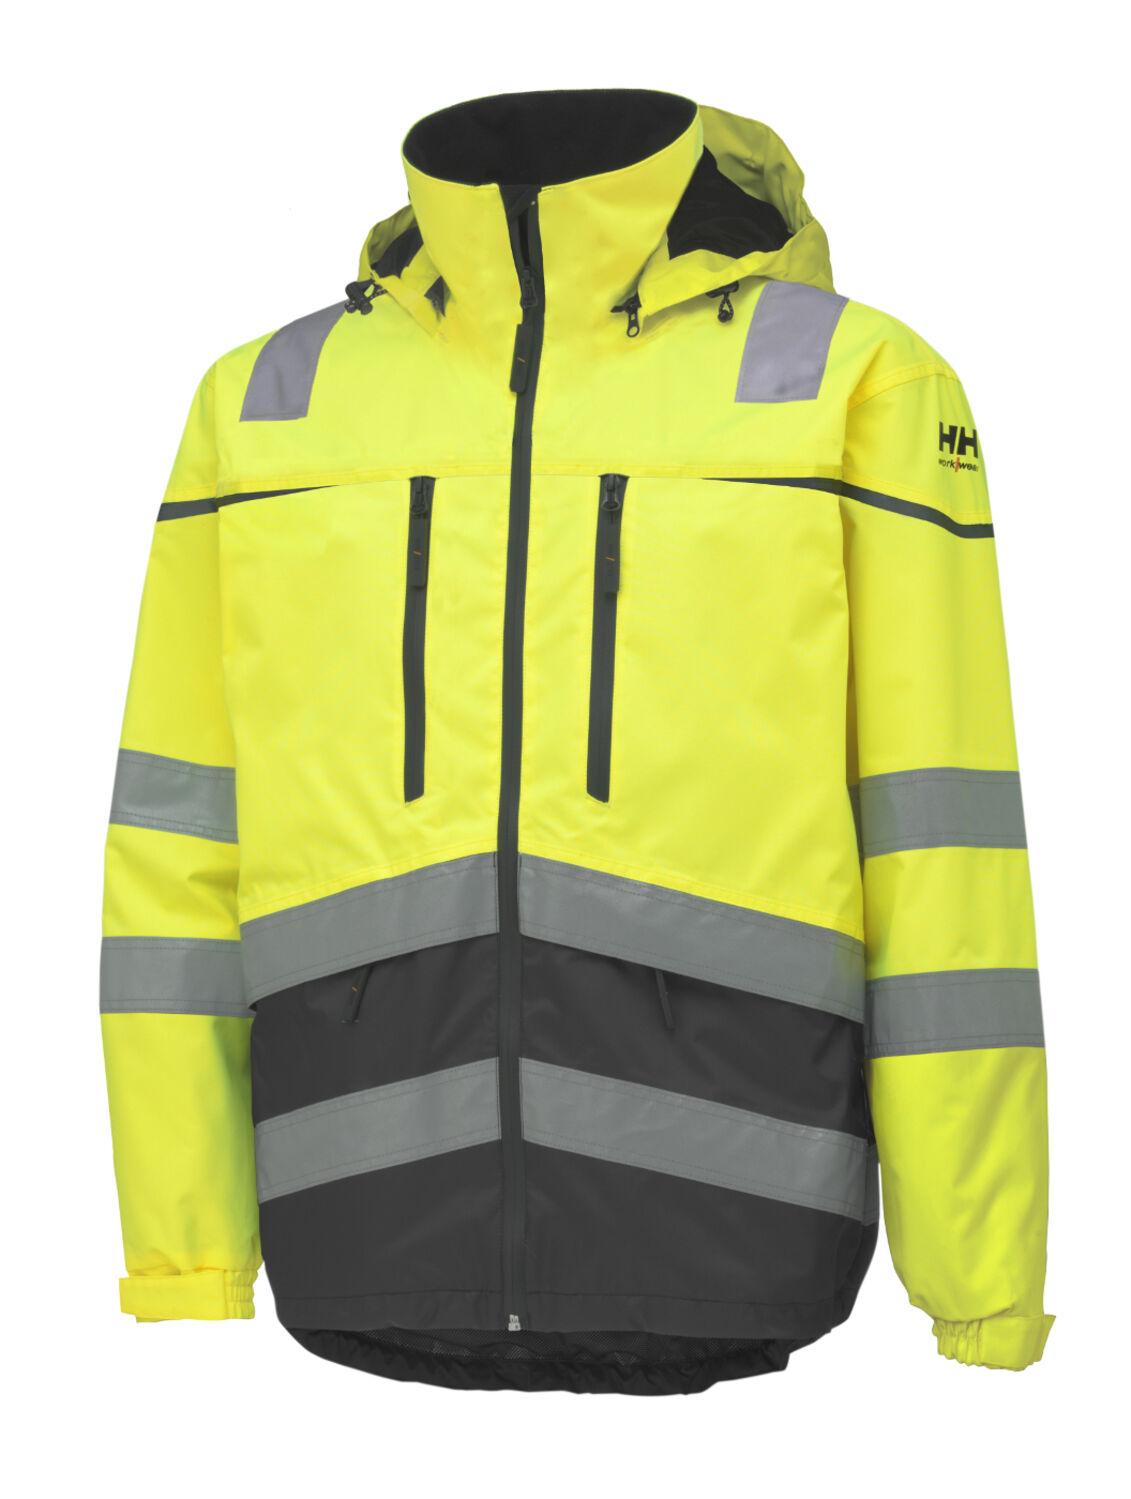 Helly Hansen Toensberg Arbeitsjacke Warnschutzjacke Winterjacke Jacke 71147